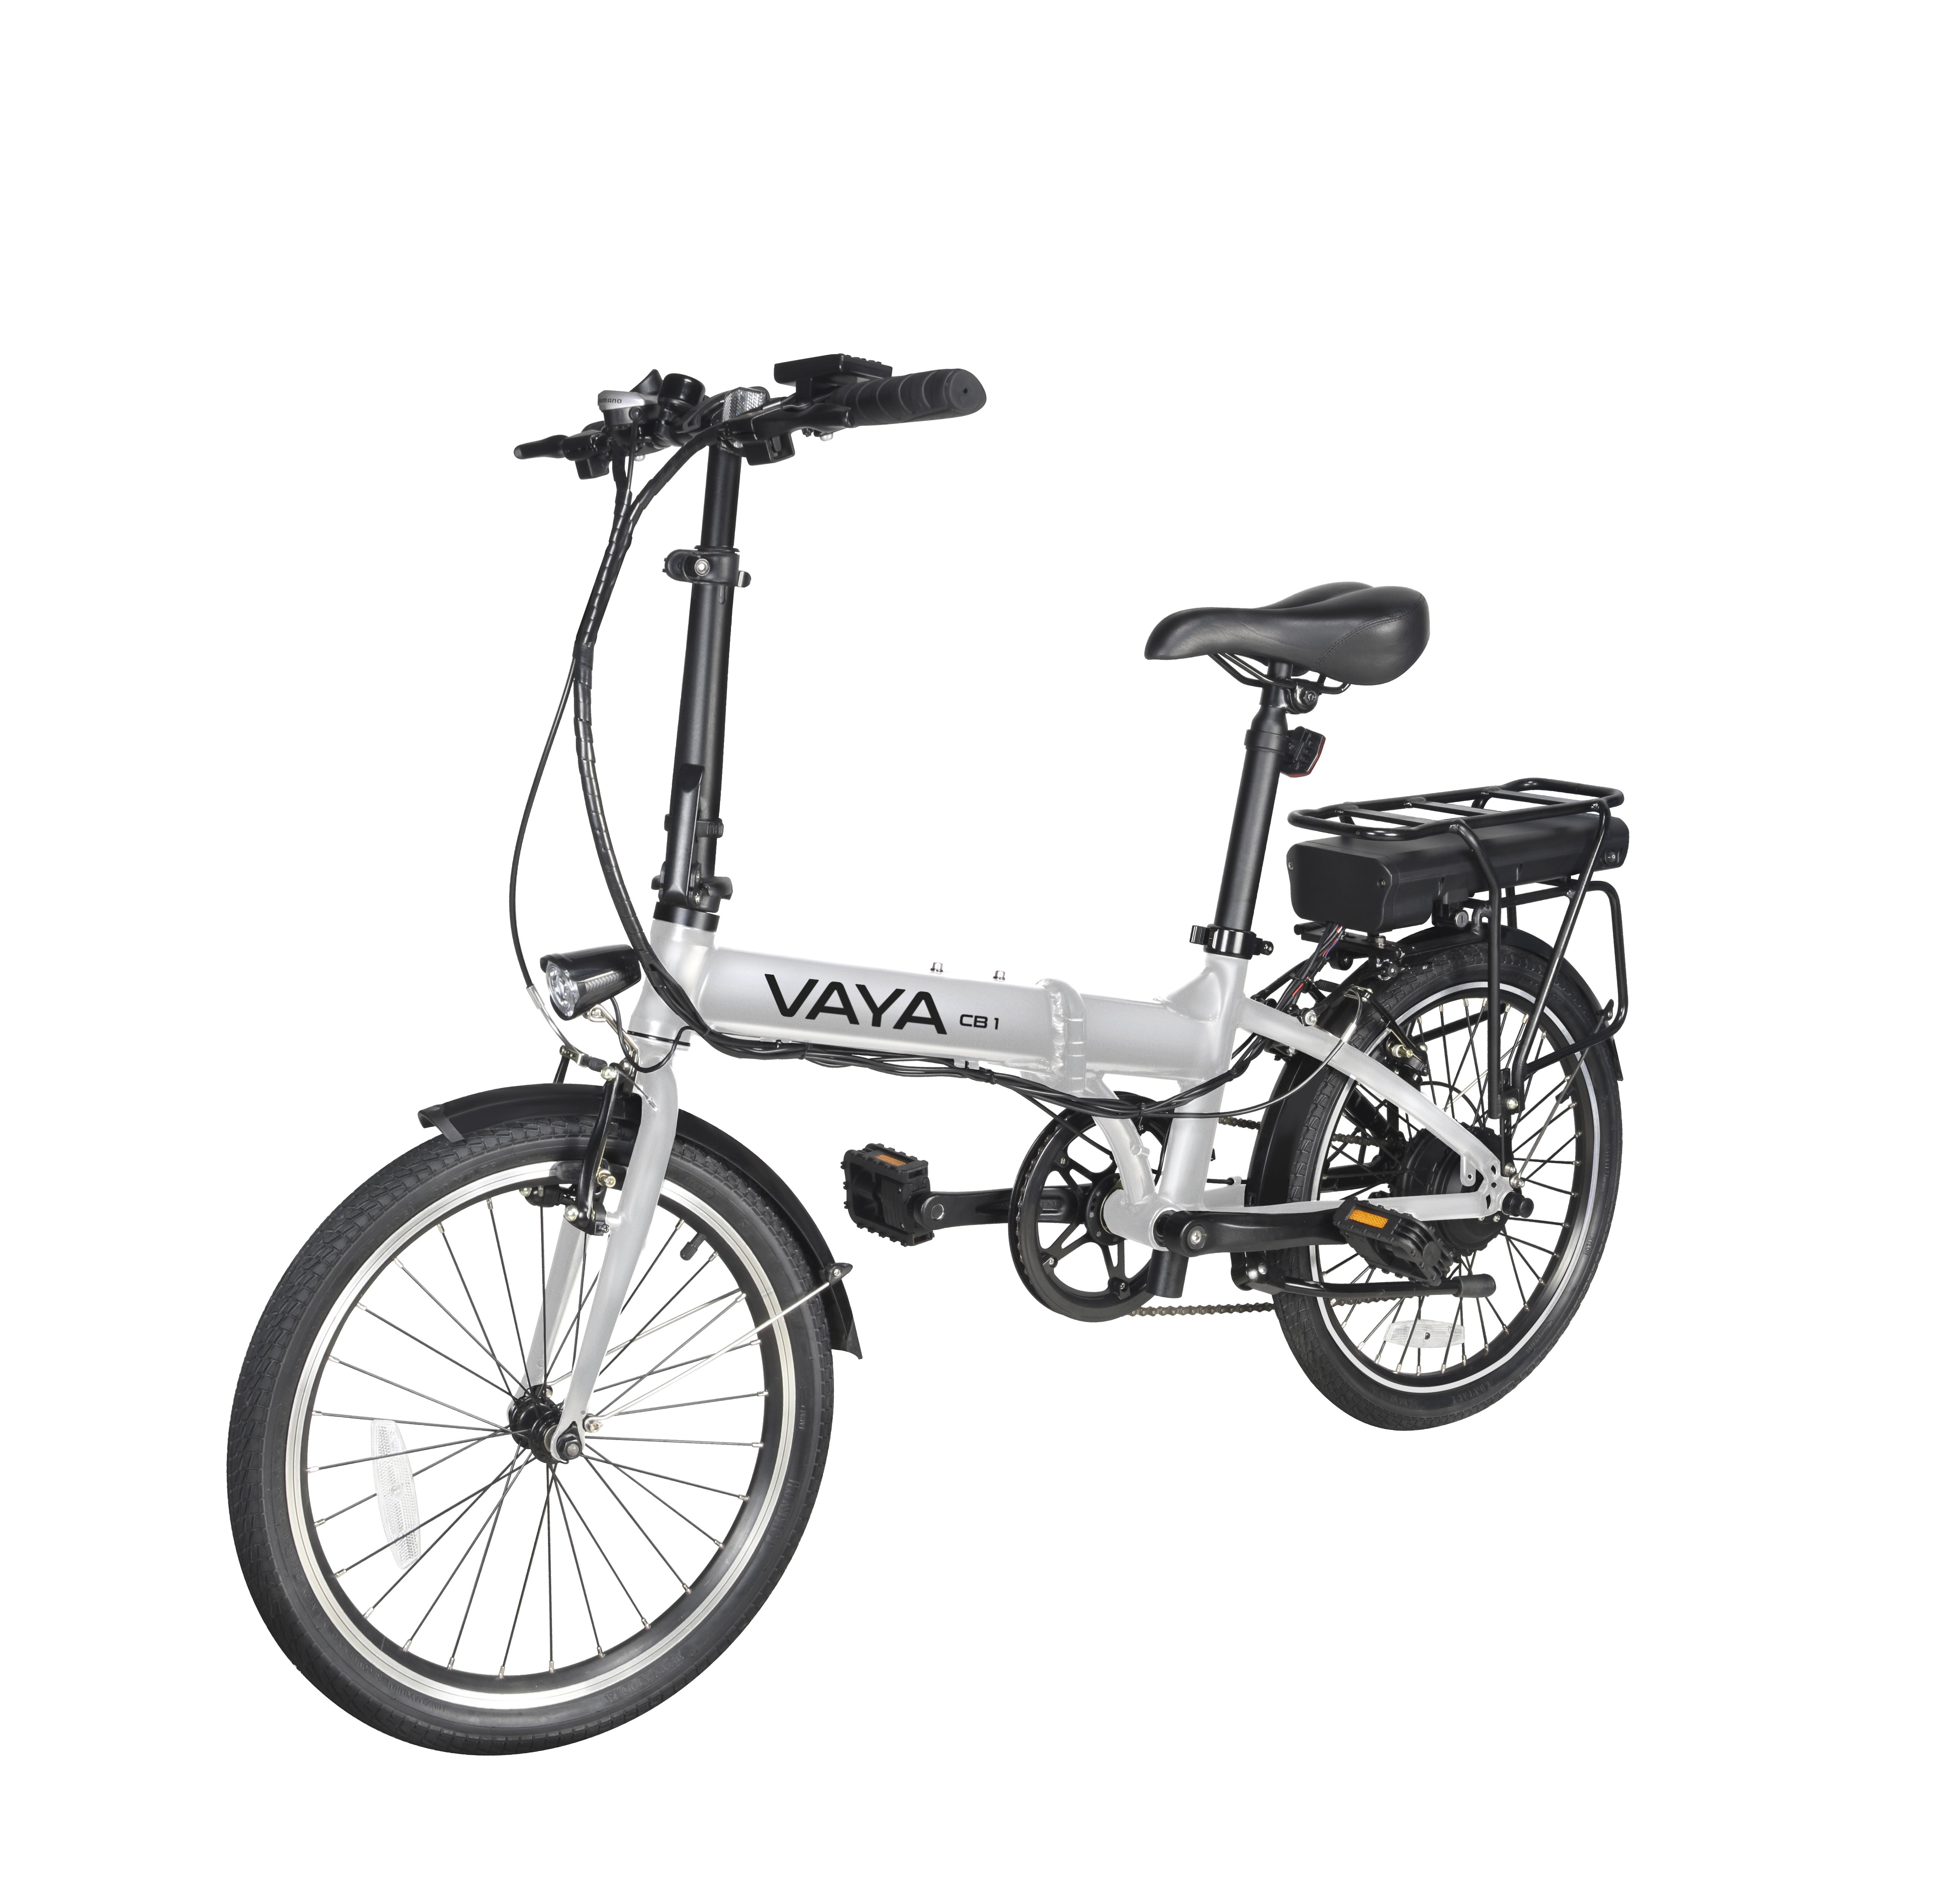 Vaya - CB-1 Electric City Bike - Silver (1641SL)